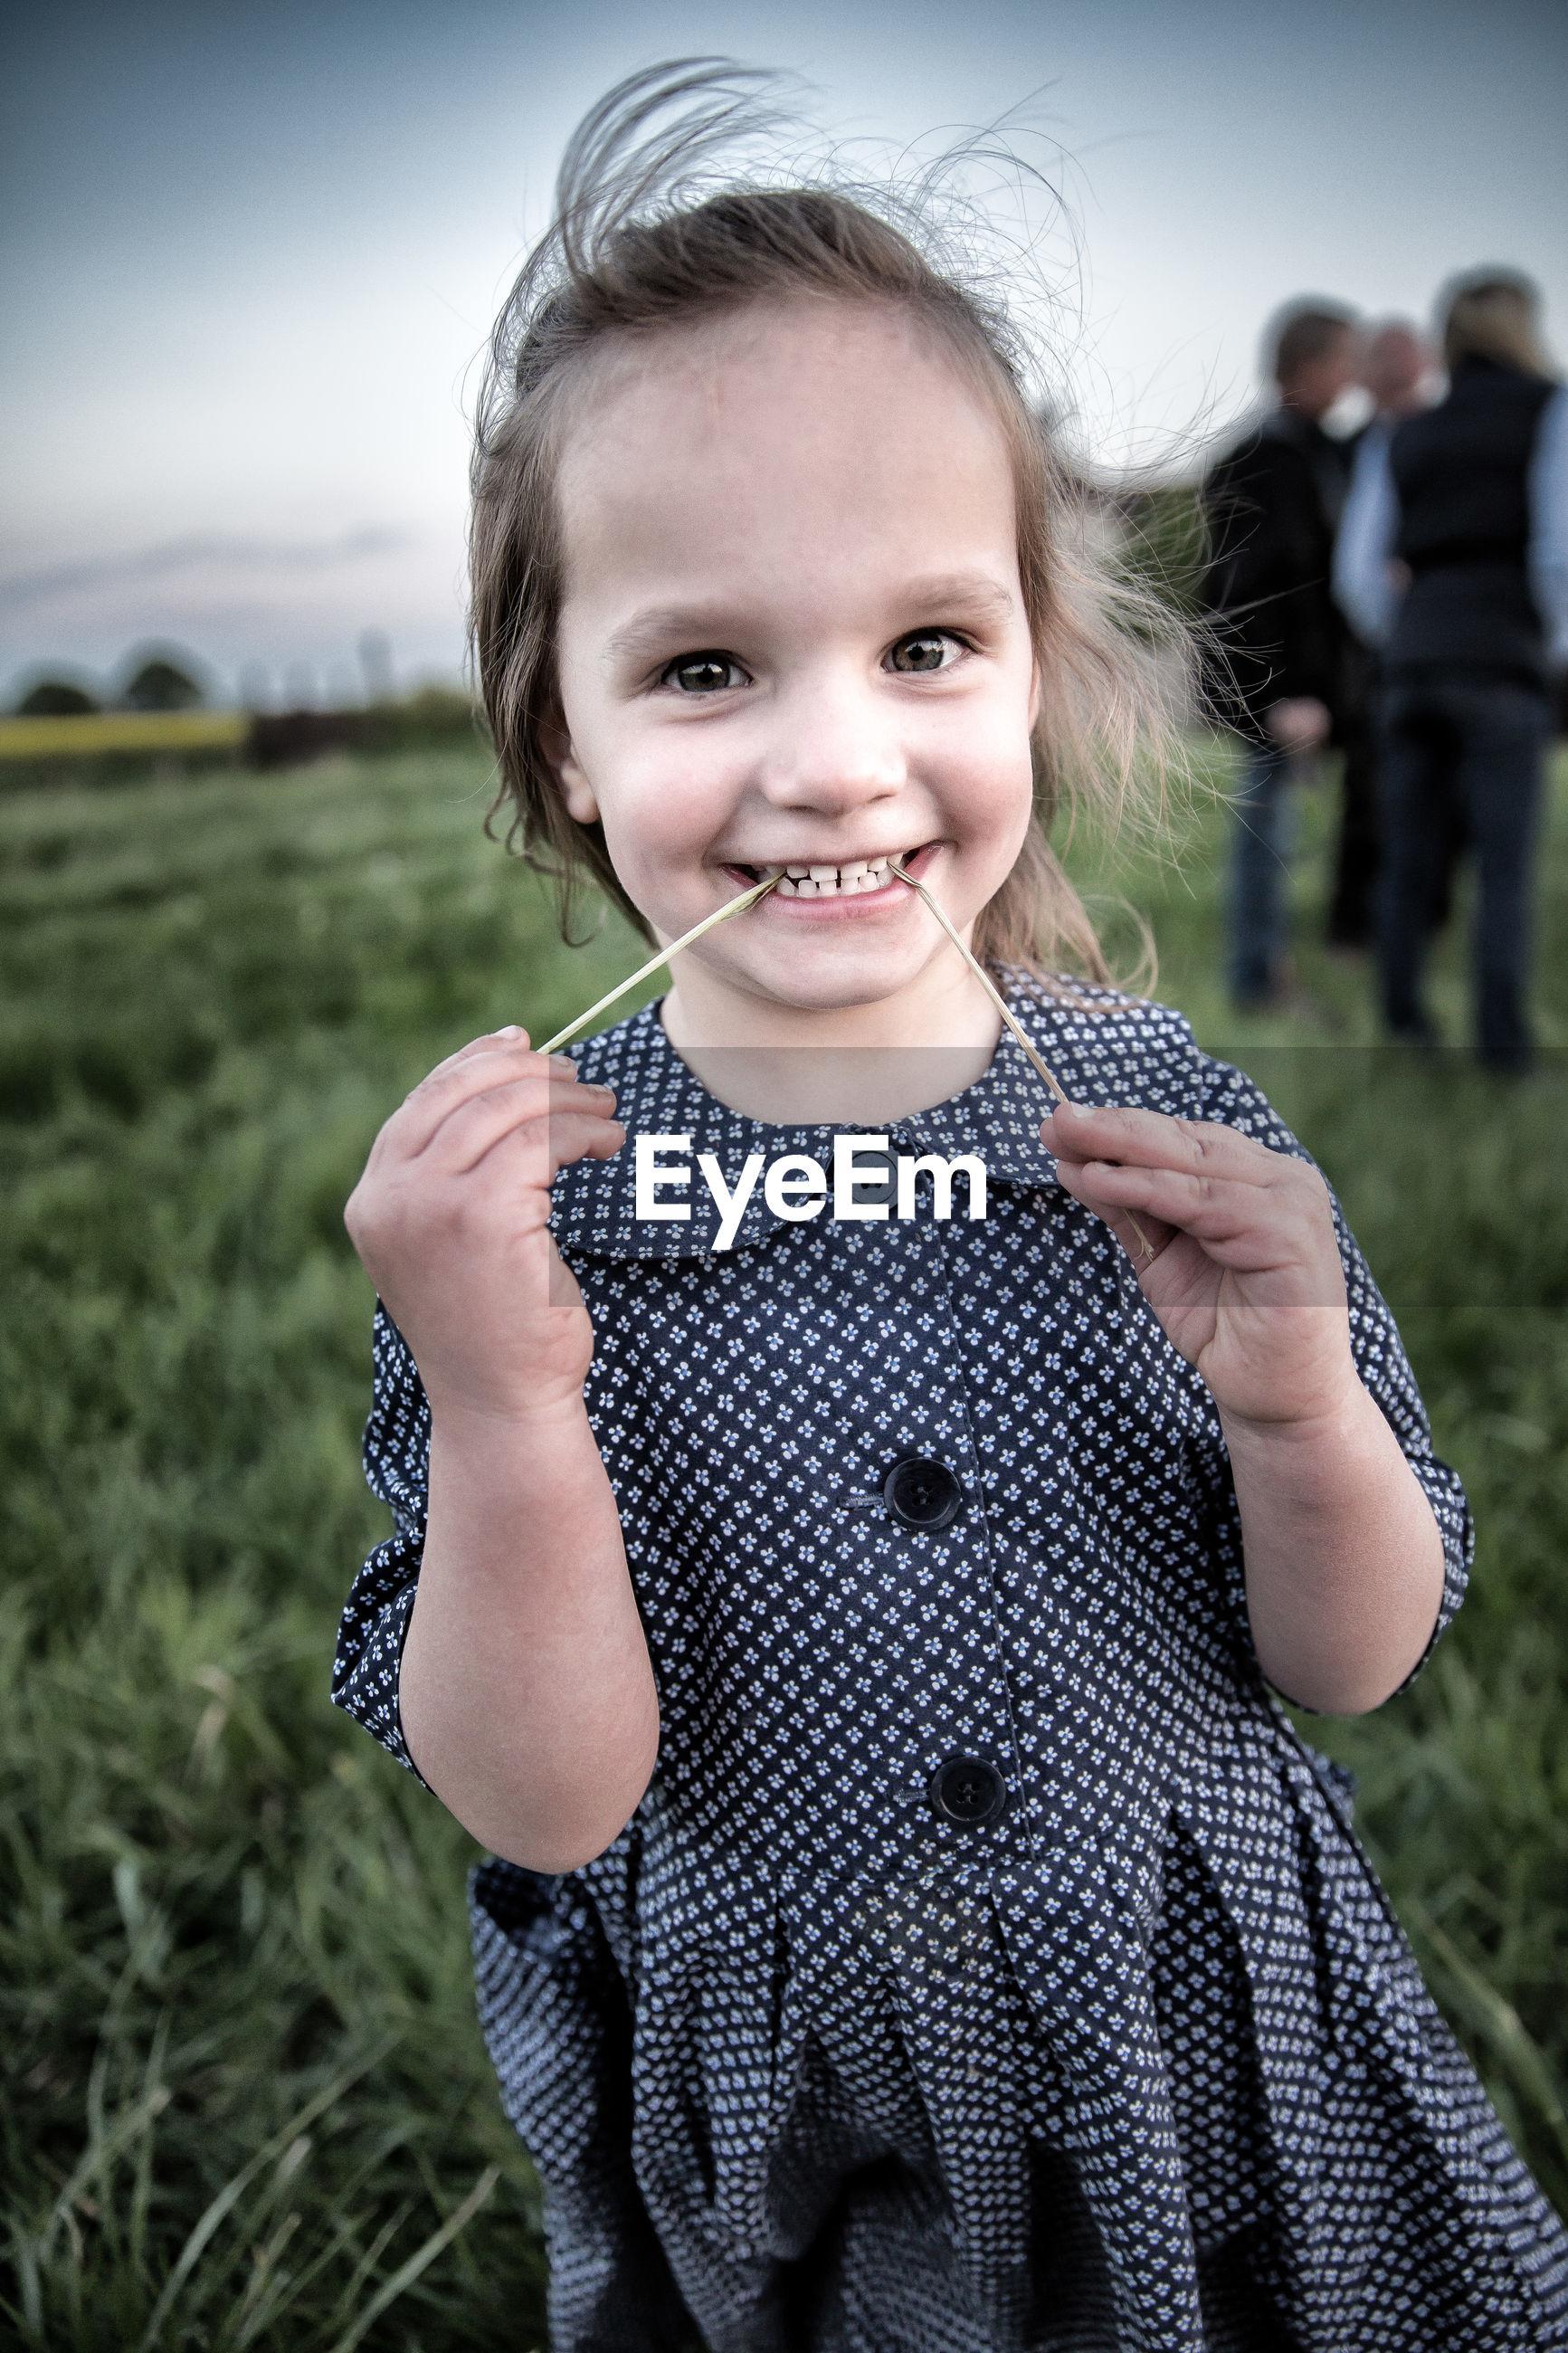 Portrait of smiling girl standing on grassy field